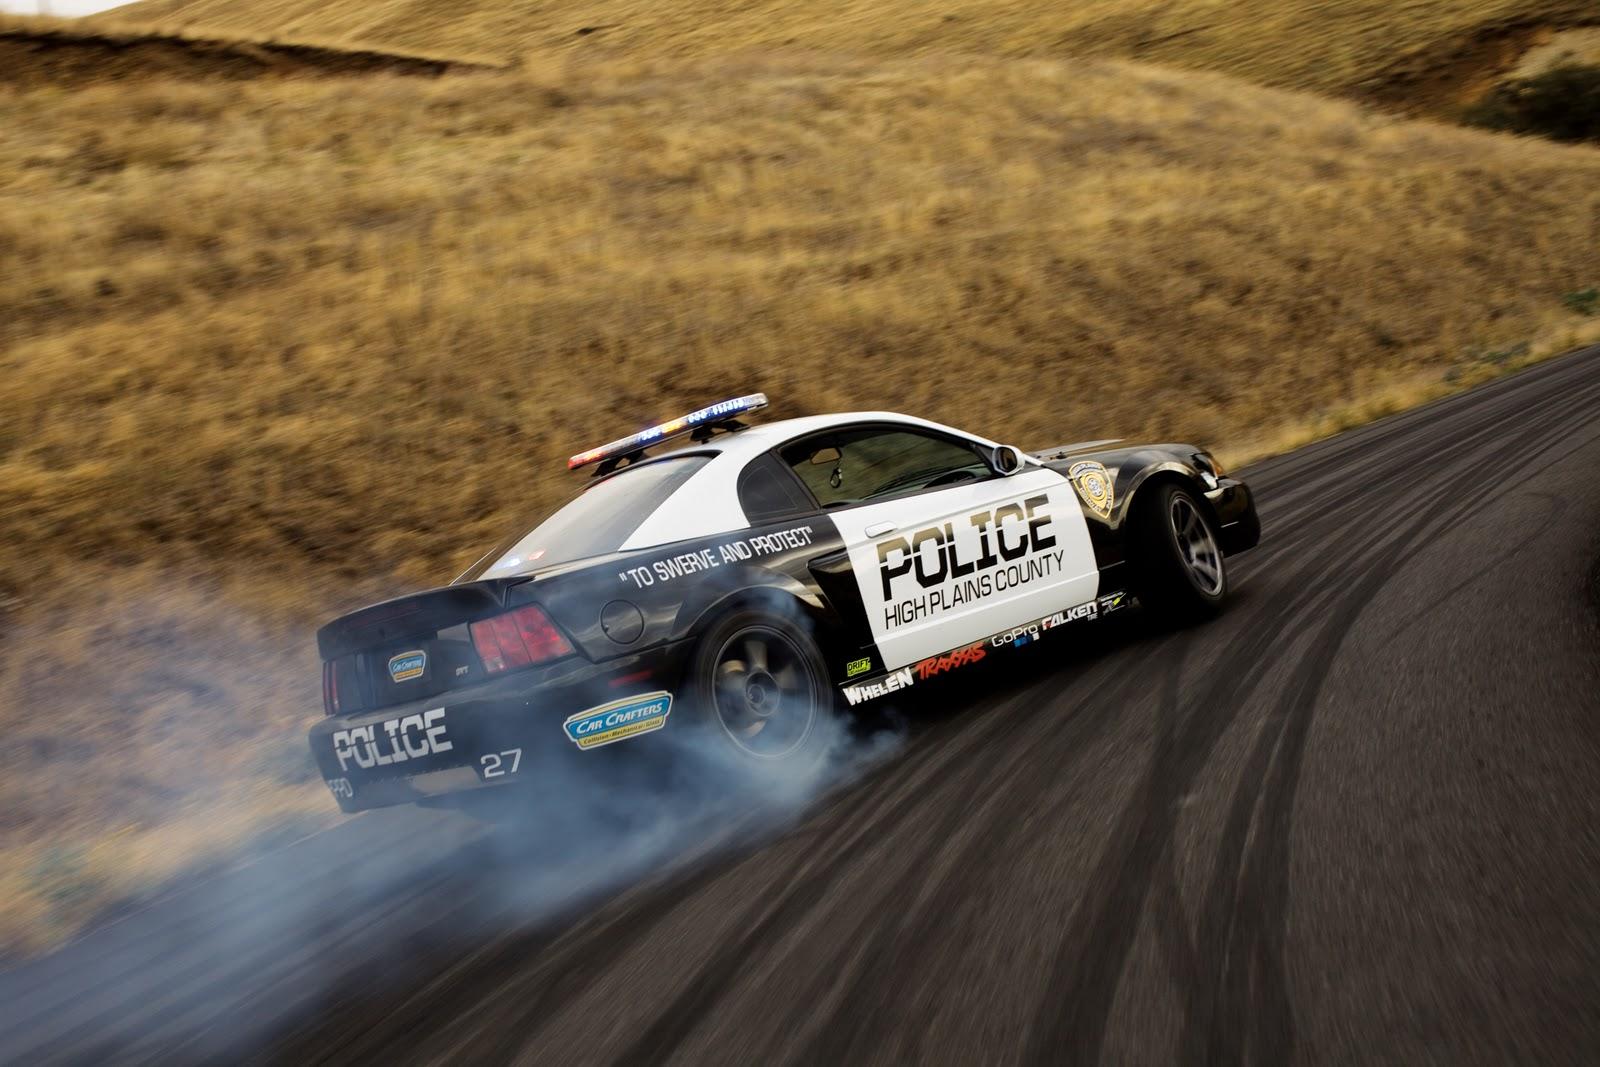 Dan Brockett Motorcycle Vs Car Drift Battle Details On The